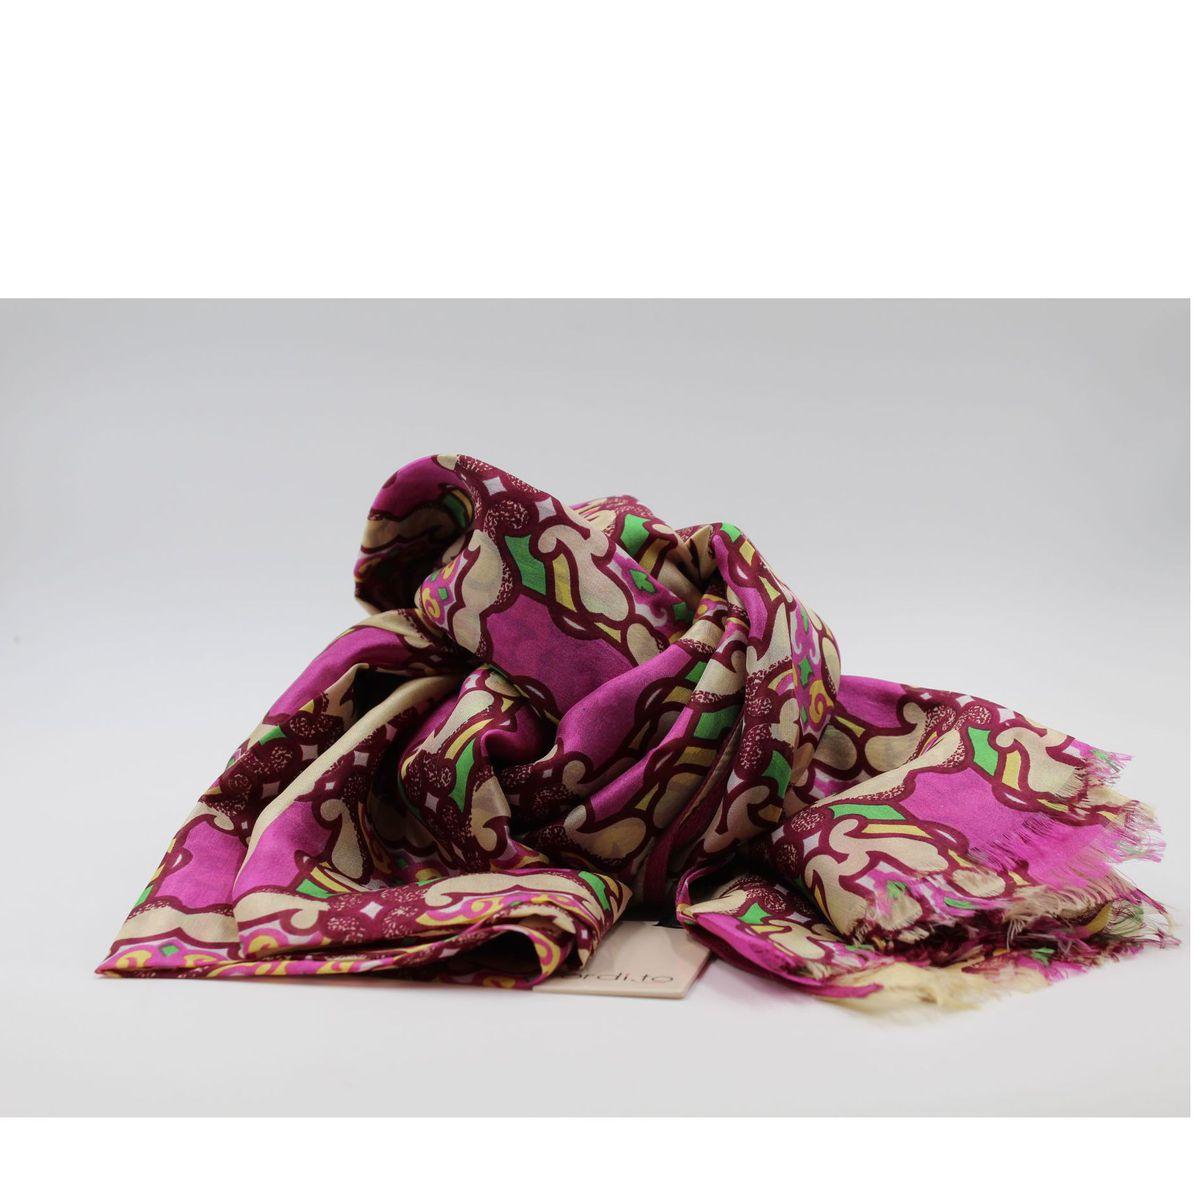 Clover scarf Fantasy 3 Ordi.to